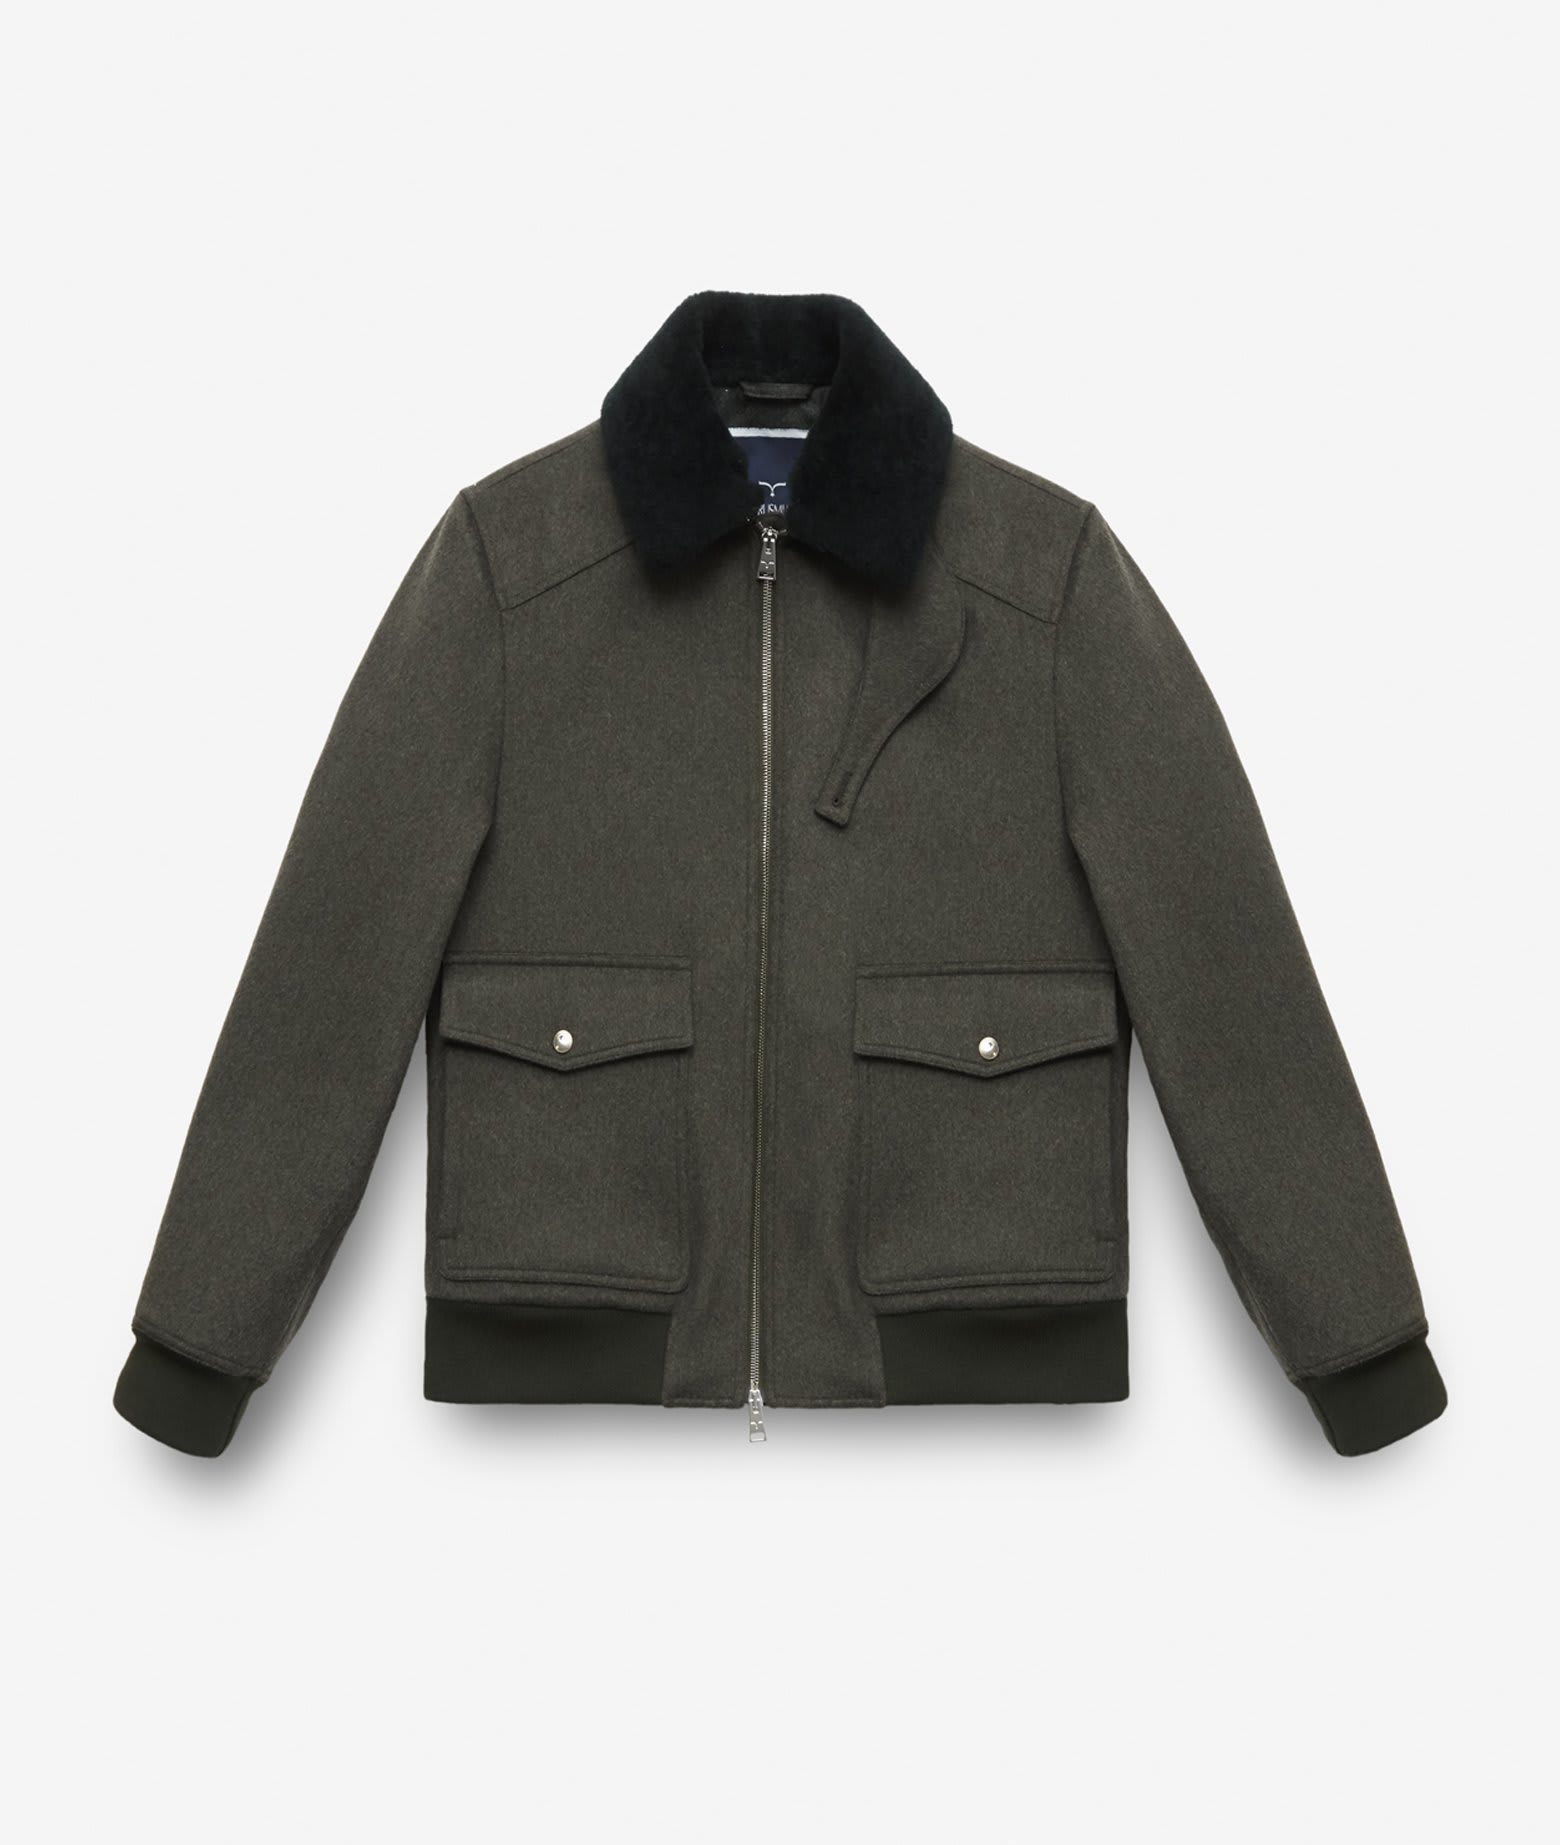 Wool Aviator Jacket transatlantic